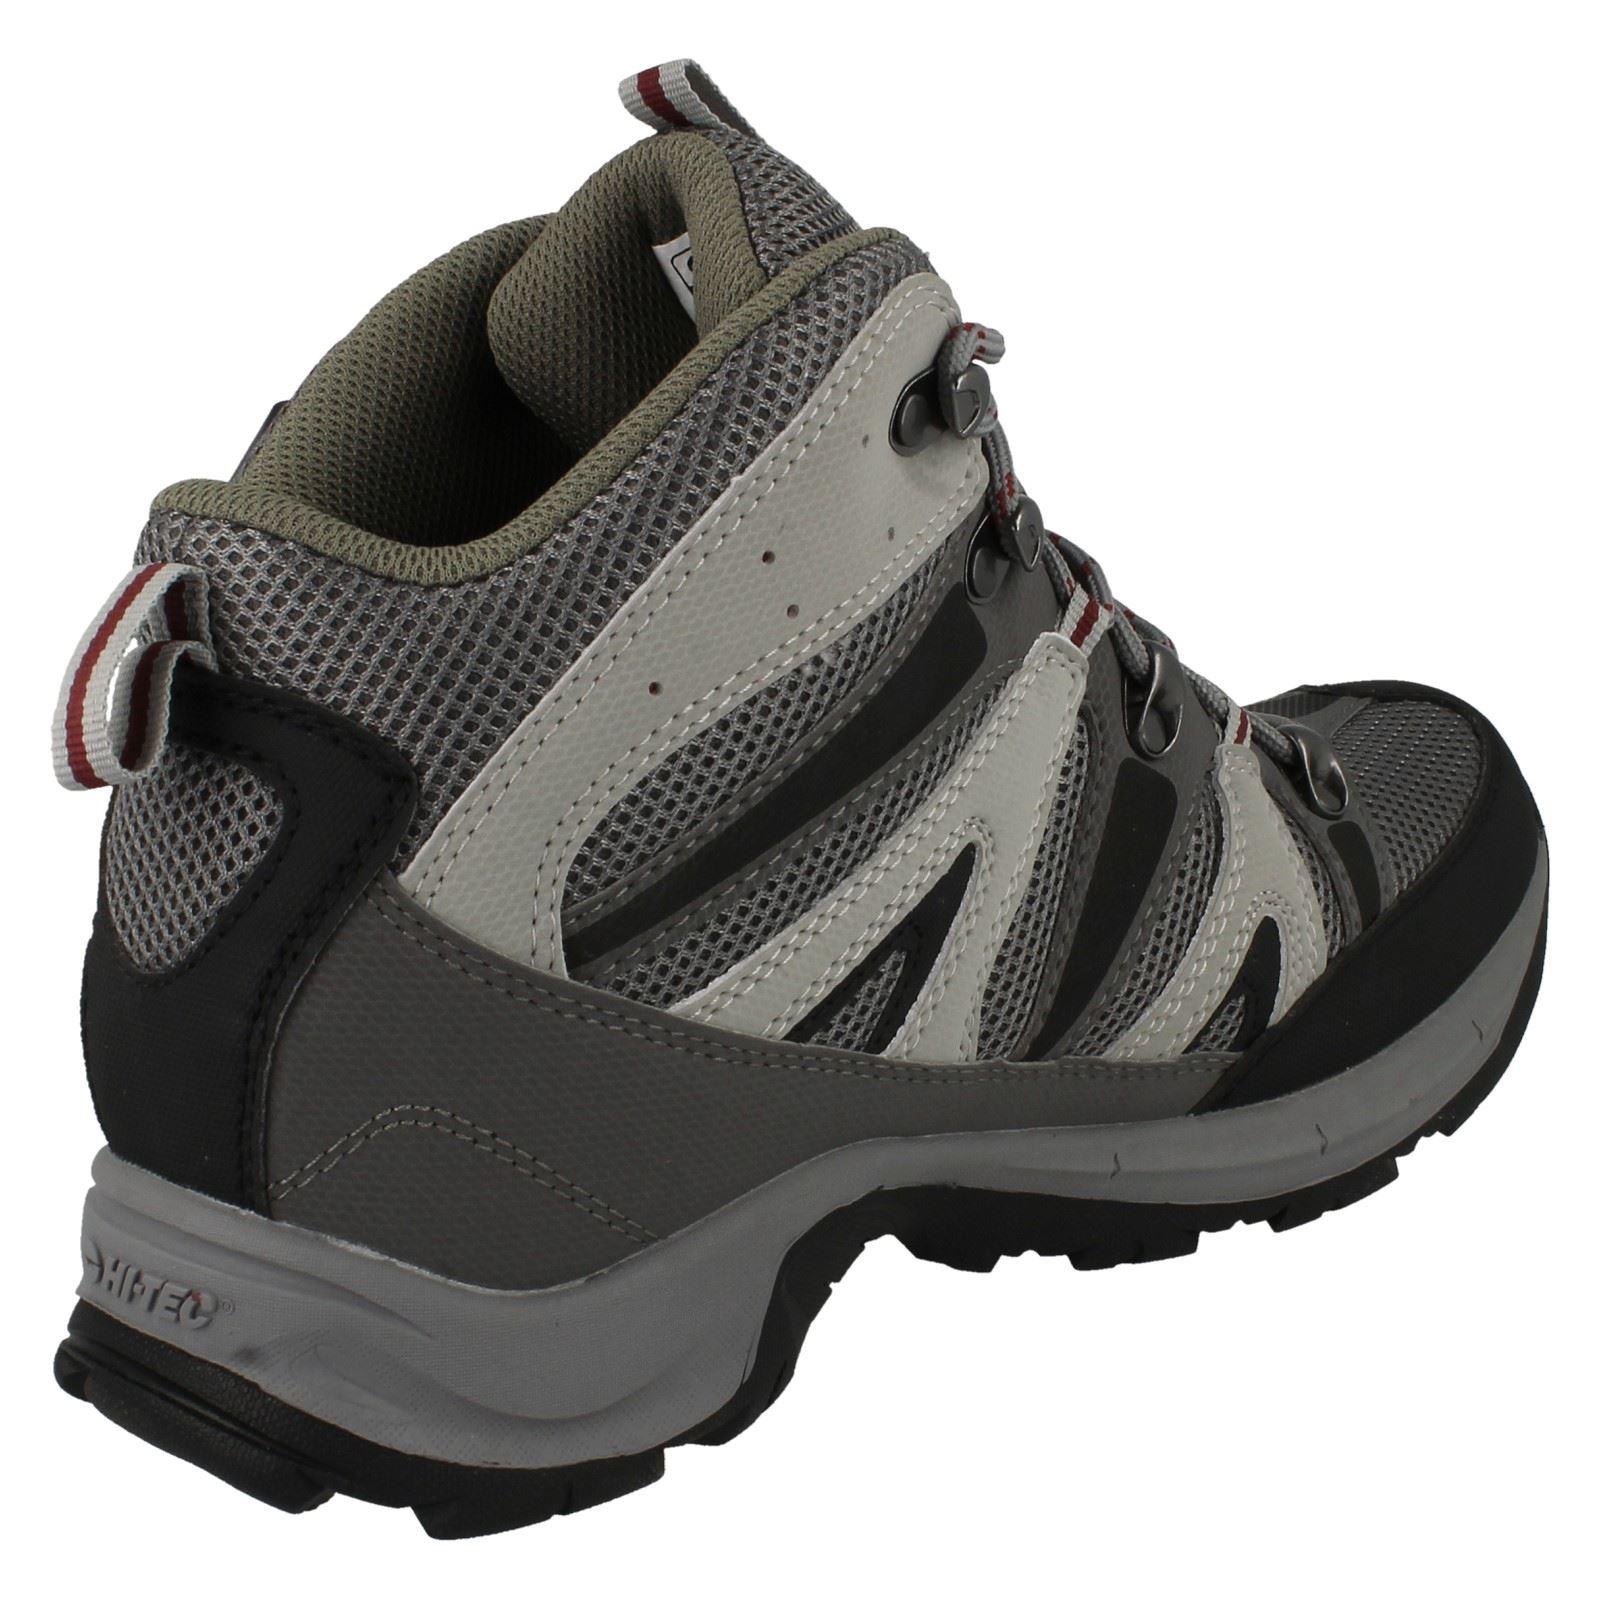 Mens Condor Black//Grey//Red Lace Up Walking Boot By Hi-tec